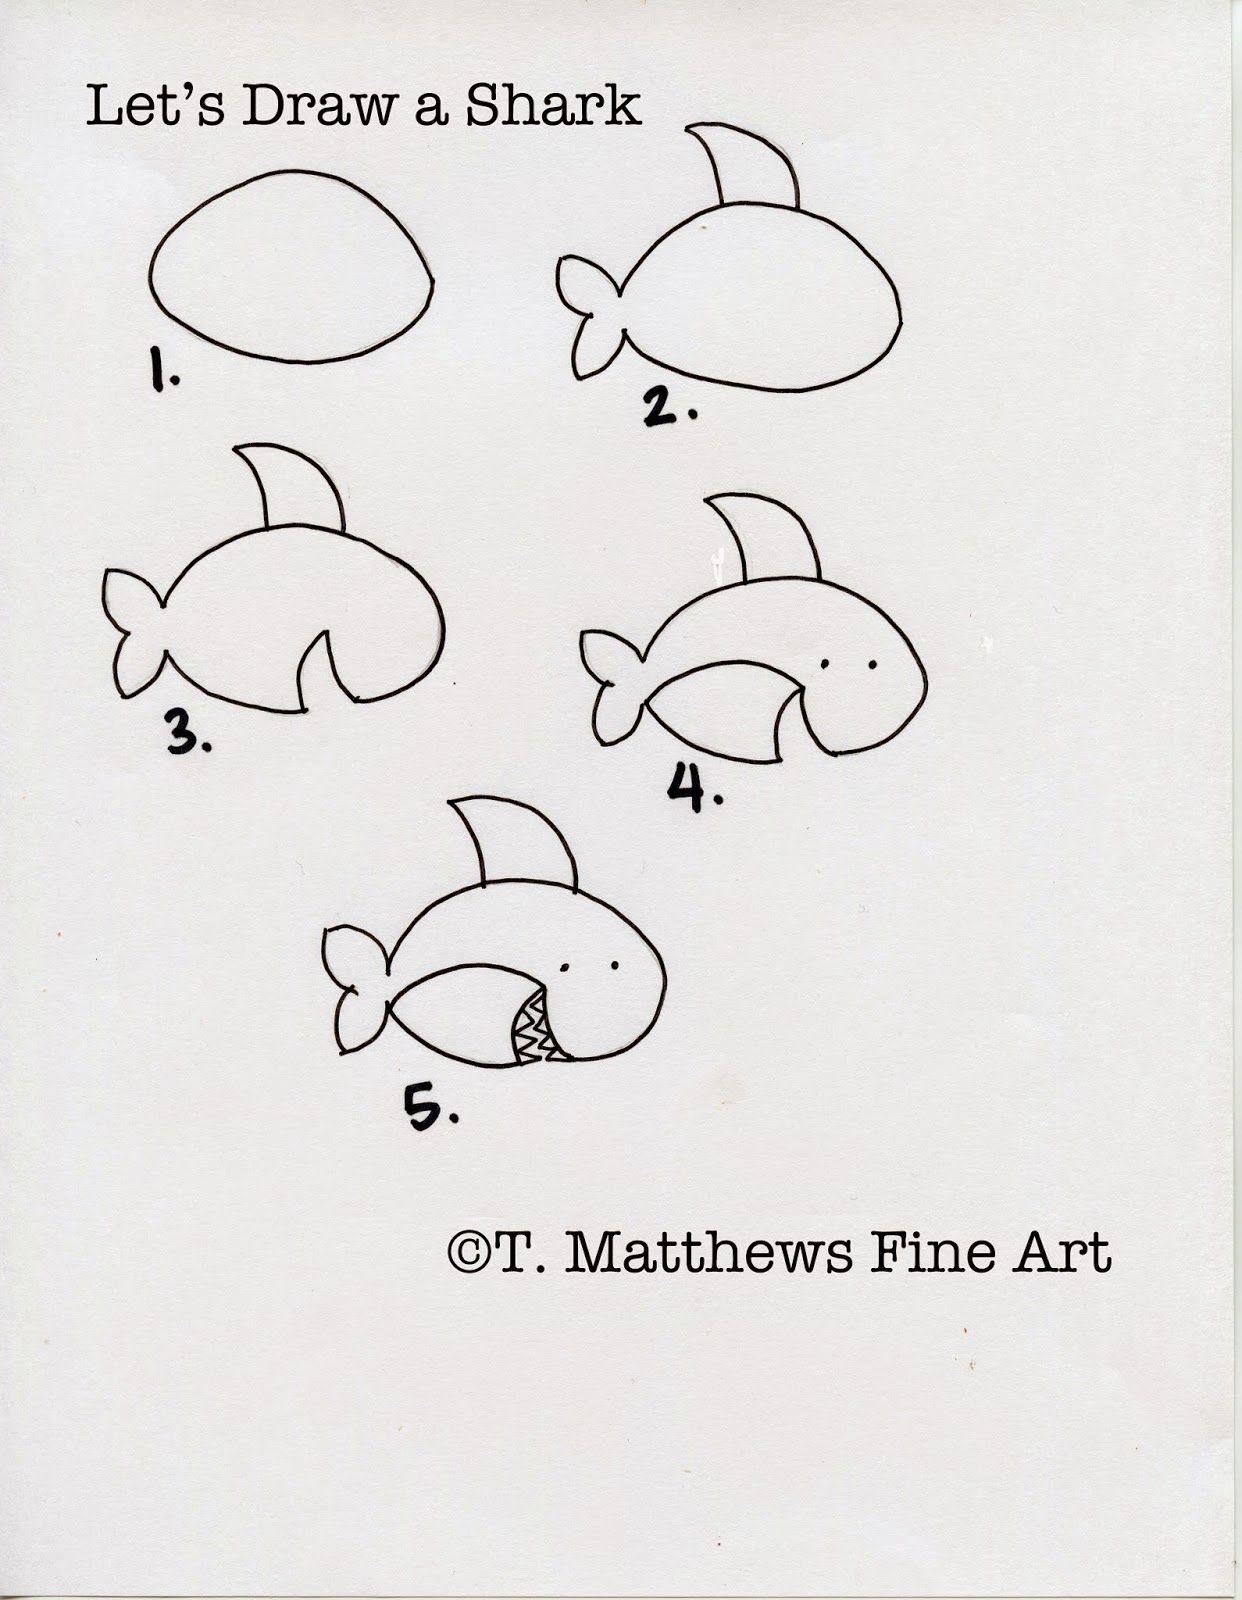 One Line Ascii Art Shark : Simple text art animals pixshark images